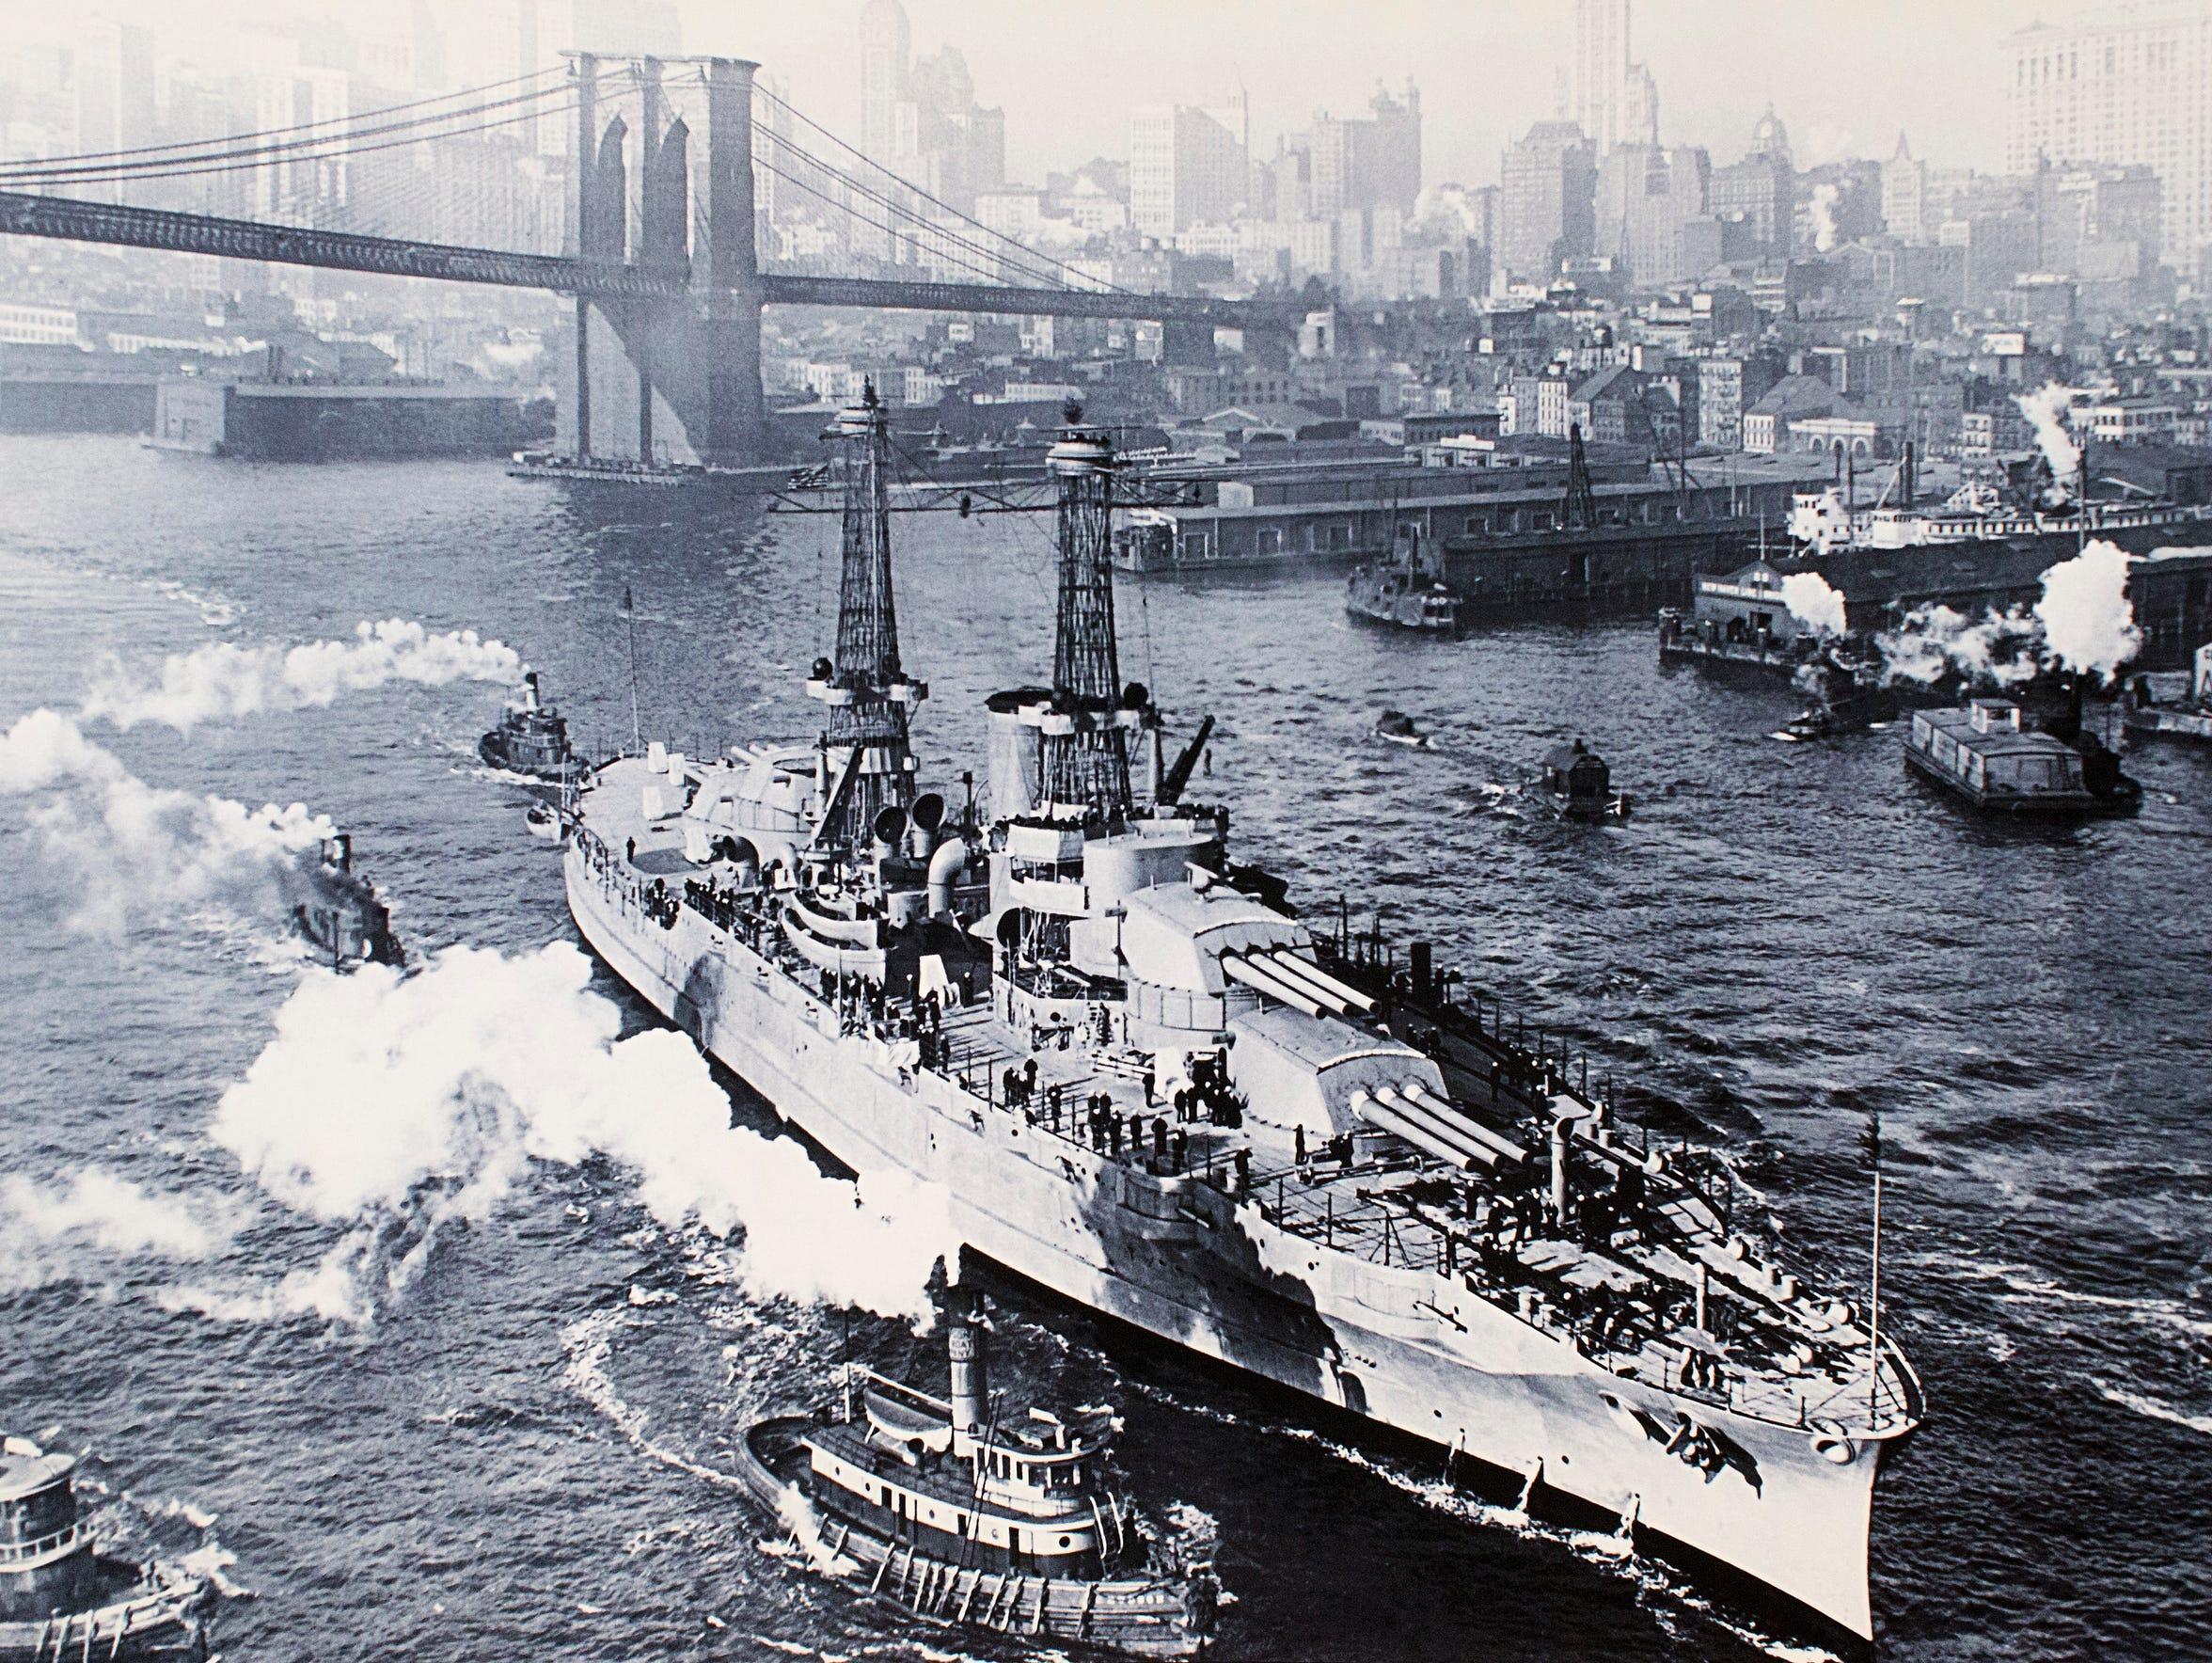 The New York City skyline and the Brooklyn Bridge can